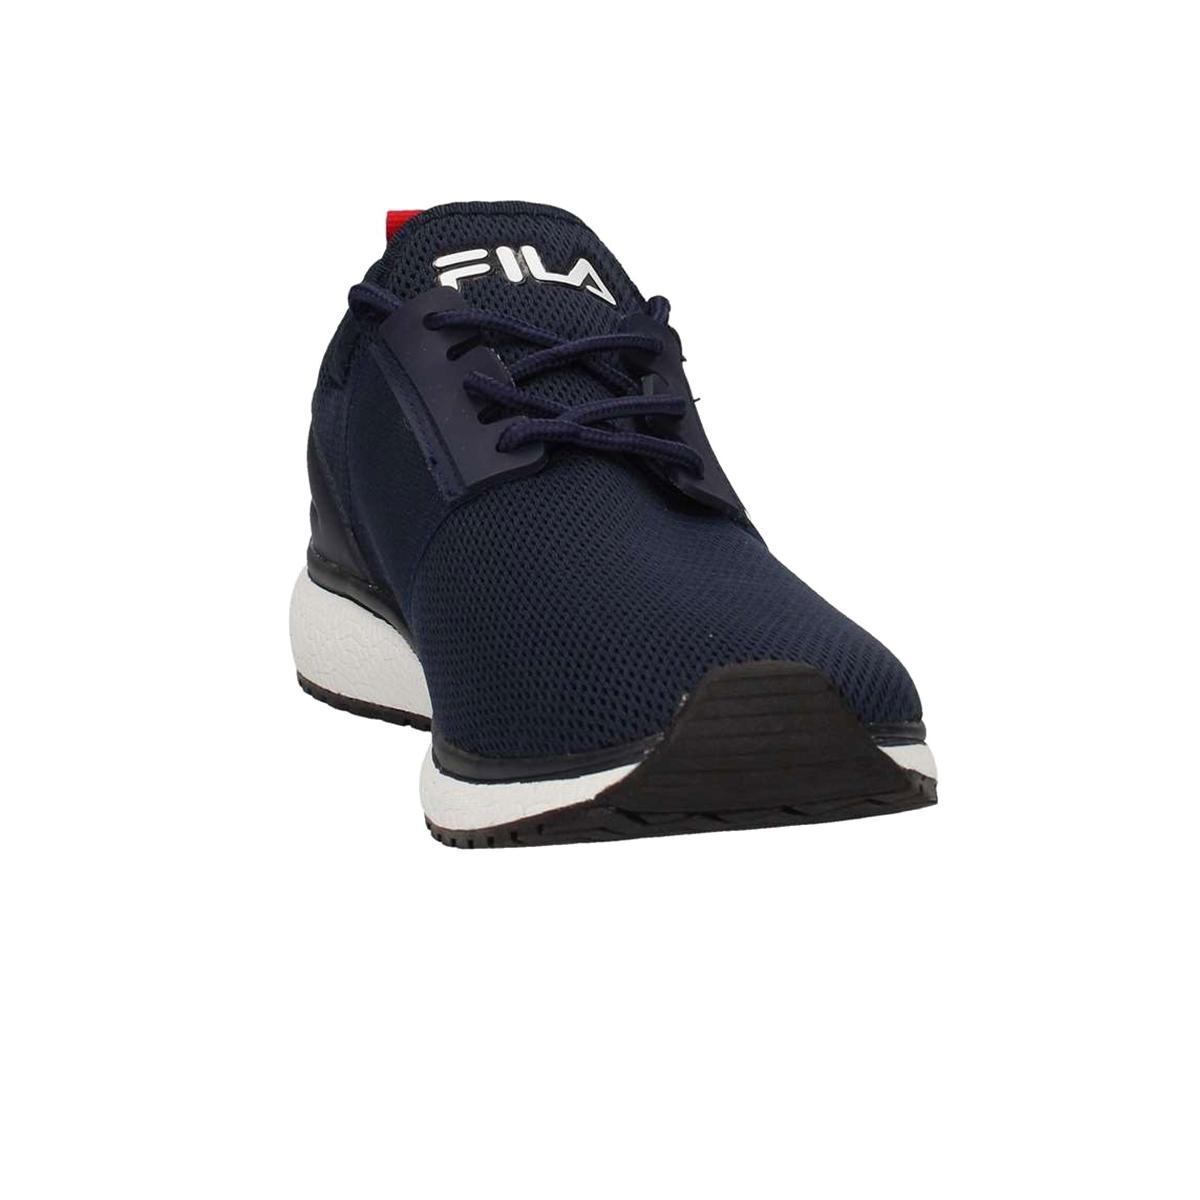 Scarpe Sneakers FILA CONTROL LOW da uomo rif. 1010277.29Y